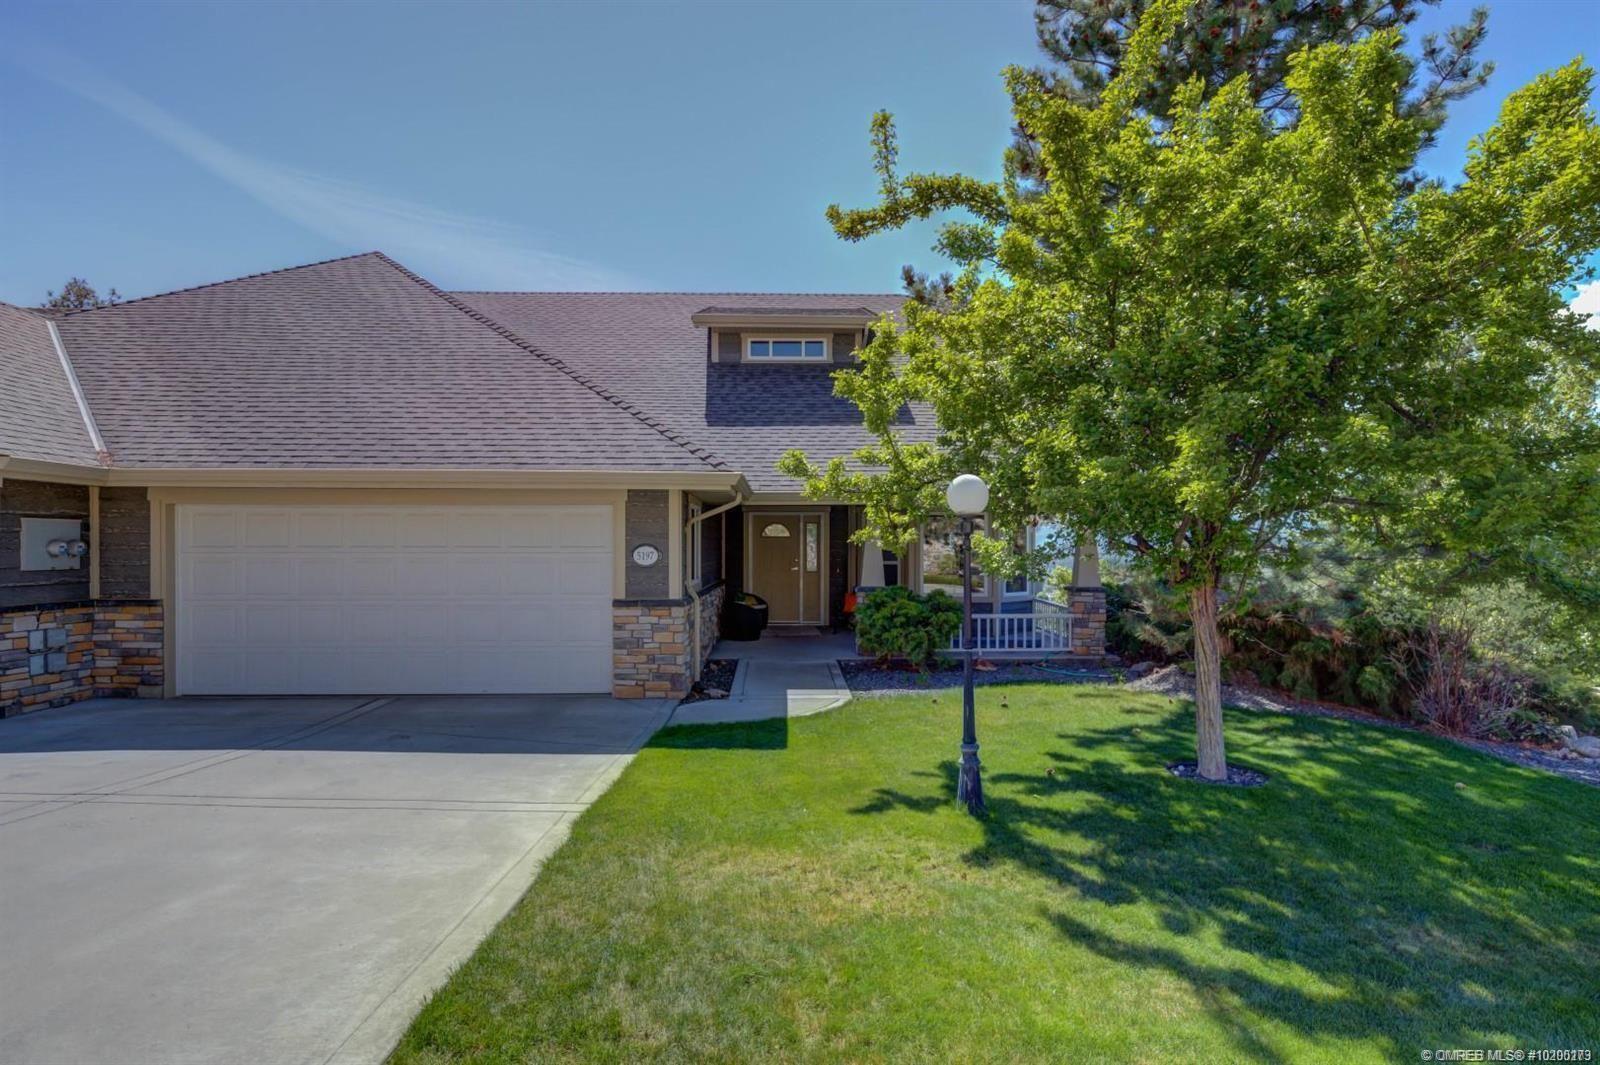 Main Photo: 5197 Silverado Place, in Kelowna: House for sale : MLS®# 10200173